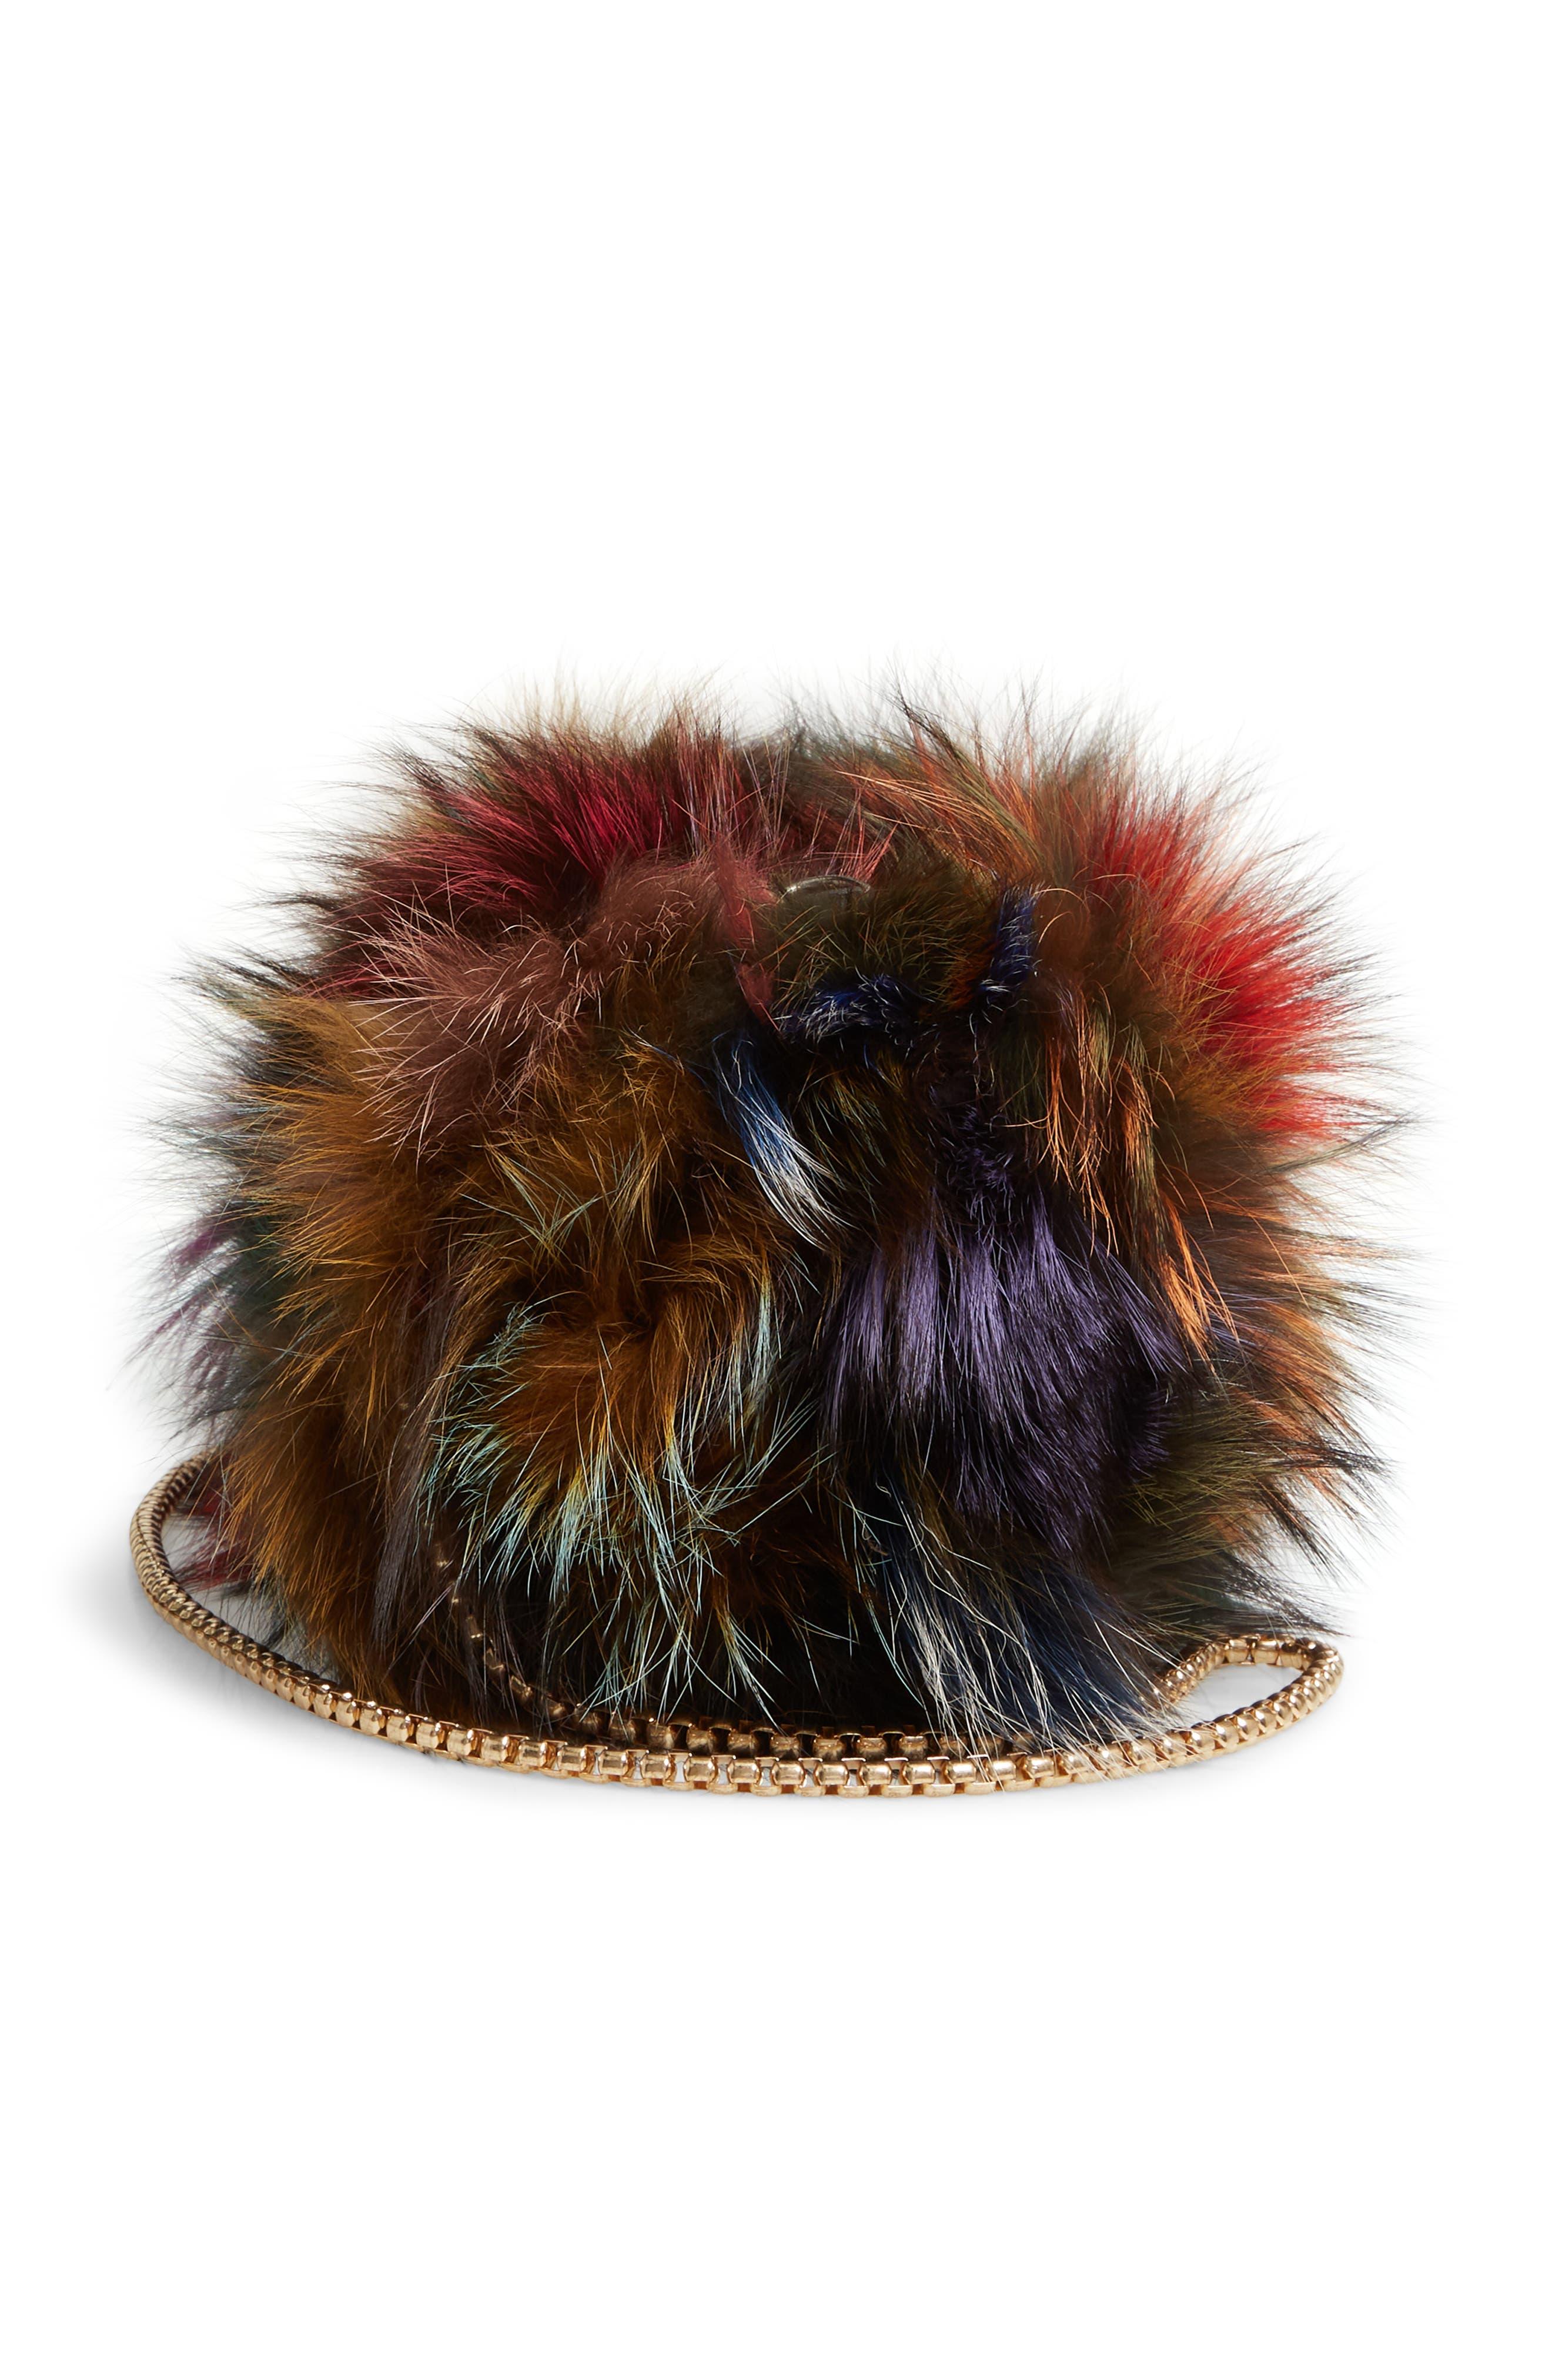 Elmo Genuine Silver Fox Fur Shoulder Bag,                             Alternate thumbnail 6, color,                             BLUE MULTI